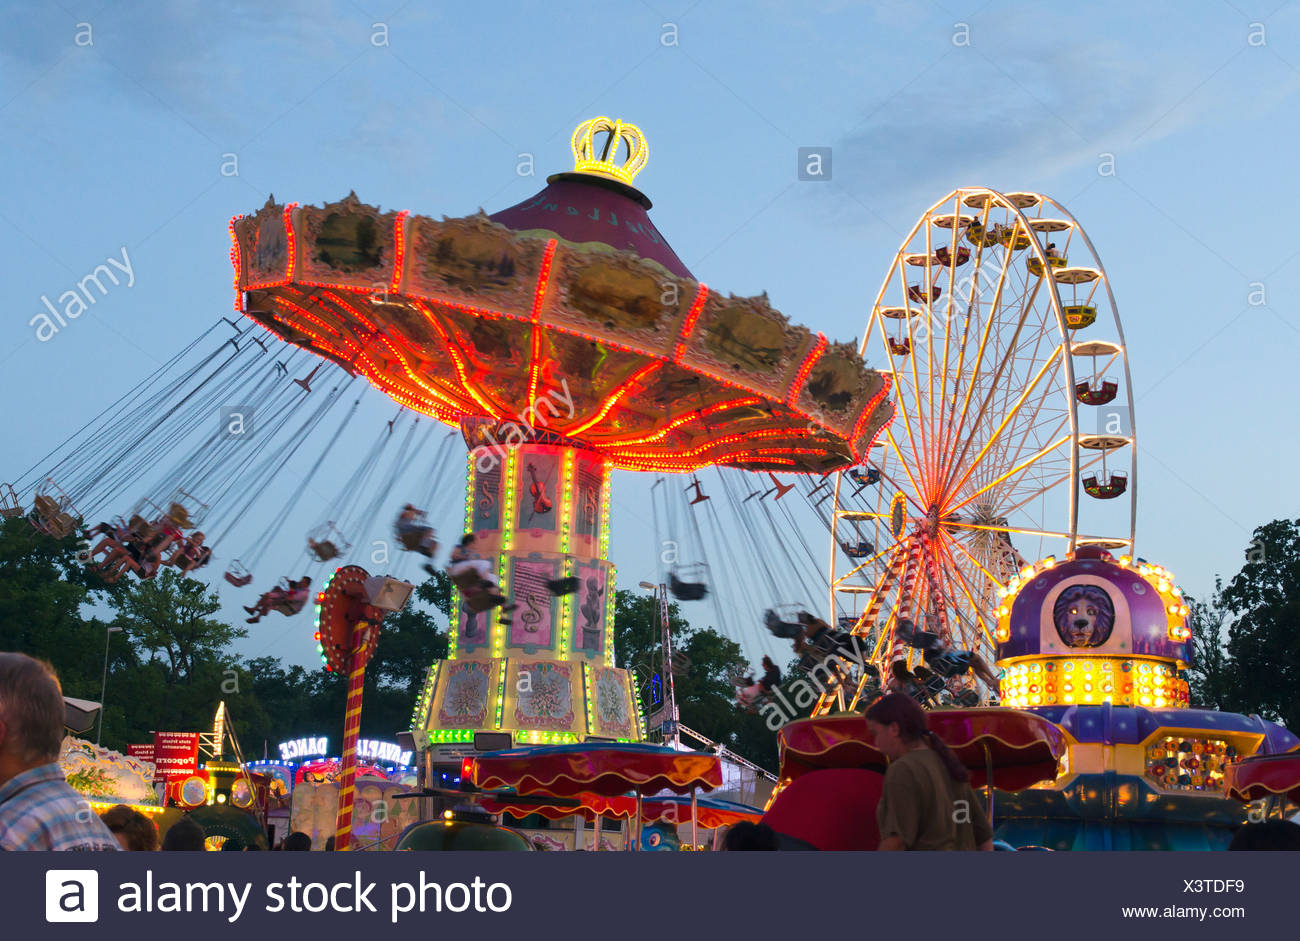 Swing caroussel and Ferris wheel at the Dult fun fair, Landshut, Bavaria, Germany, Europe Stock Photo